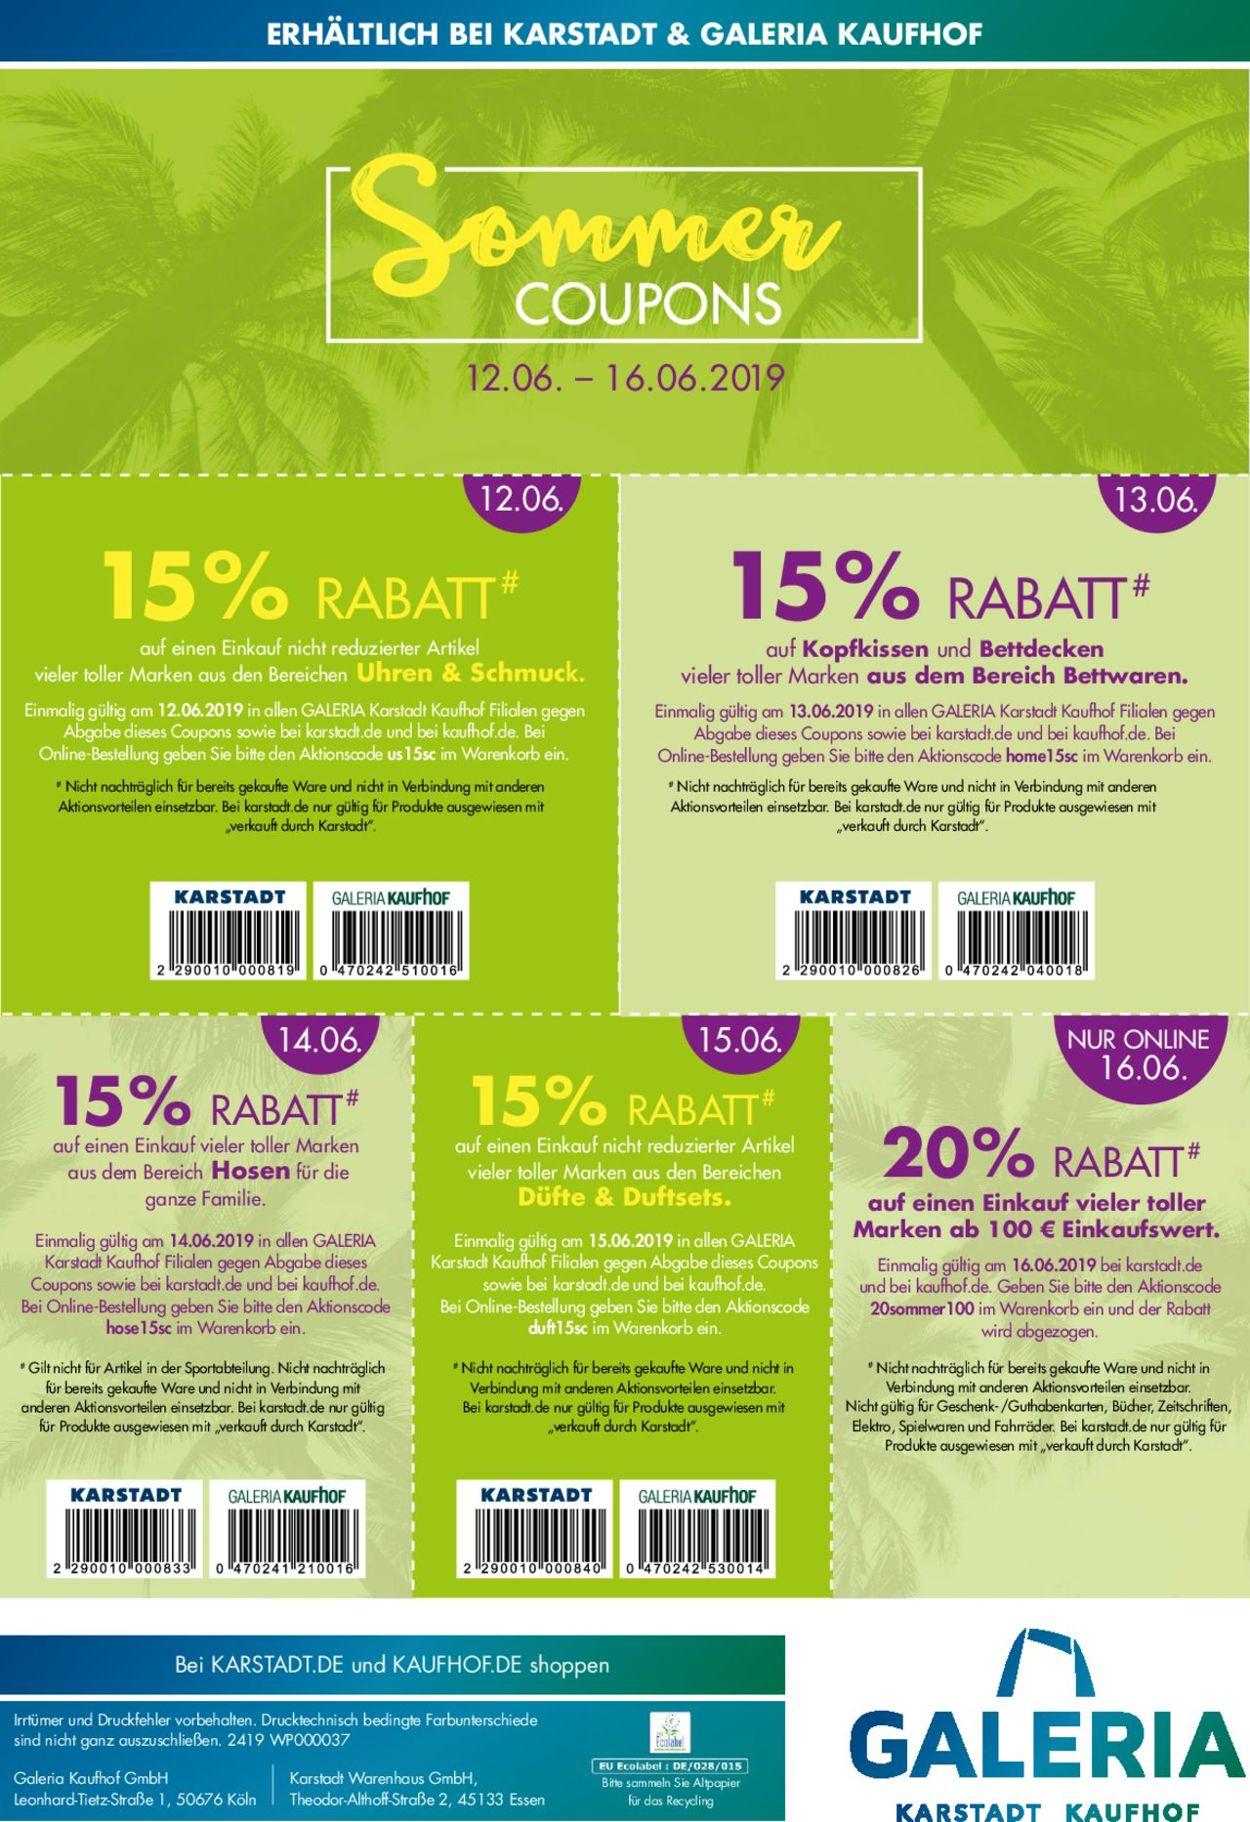 karstadt online coupon